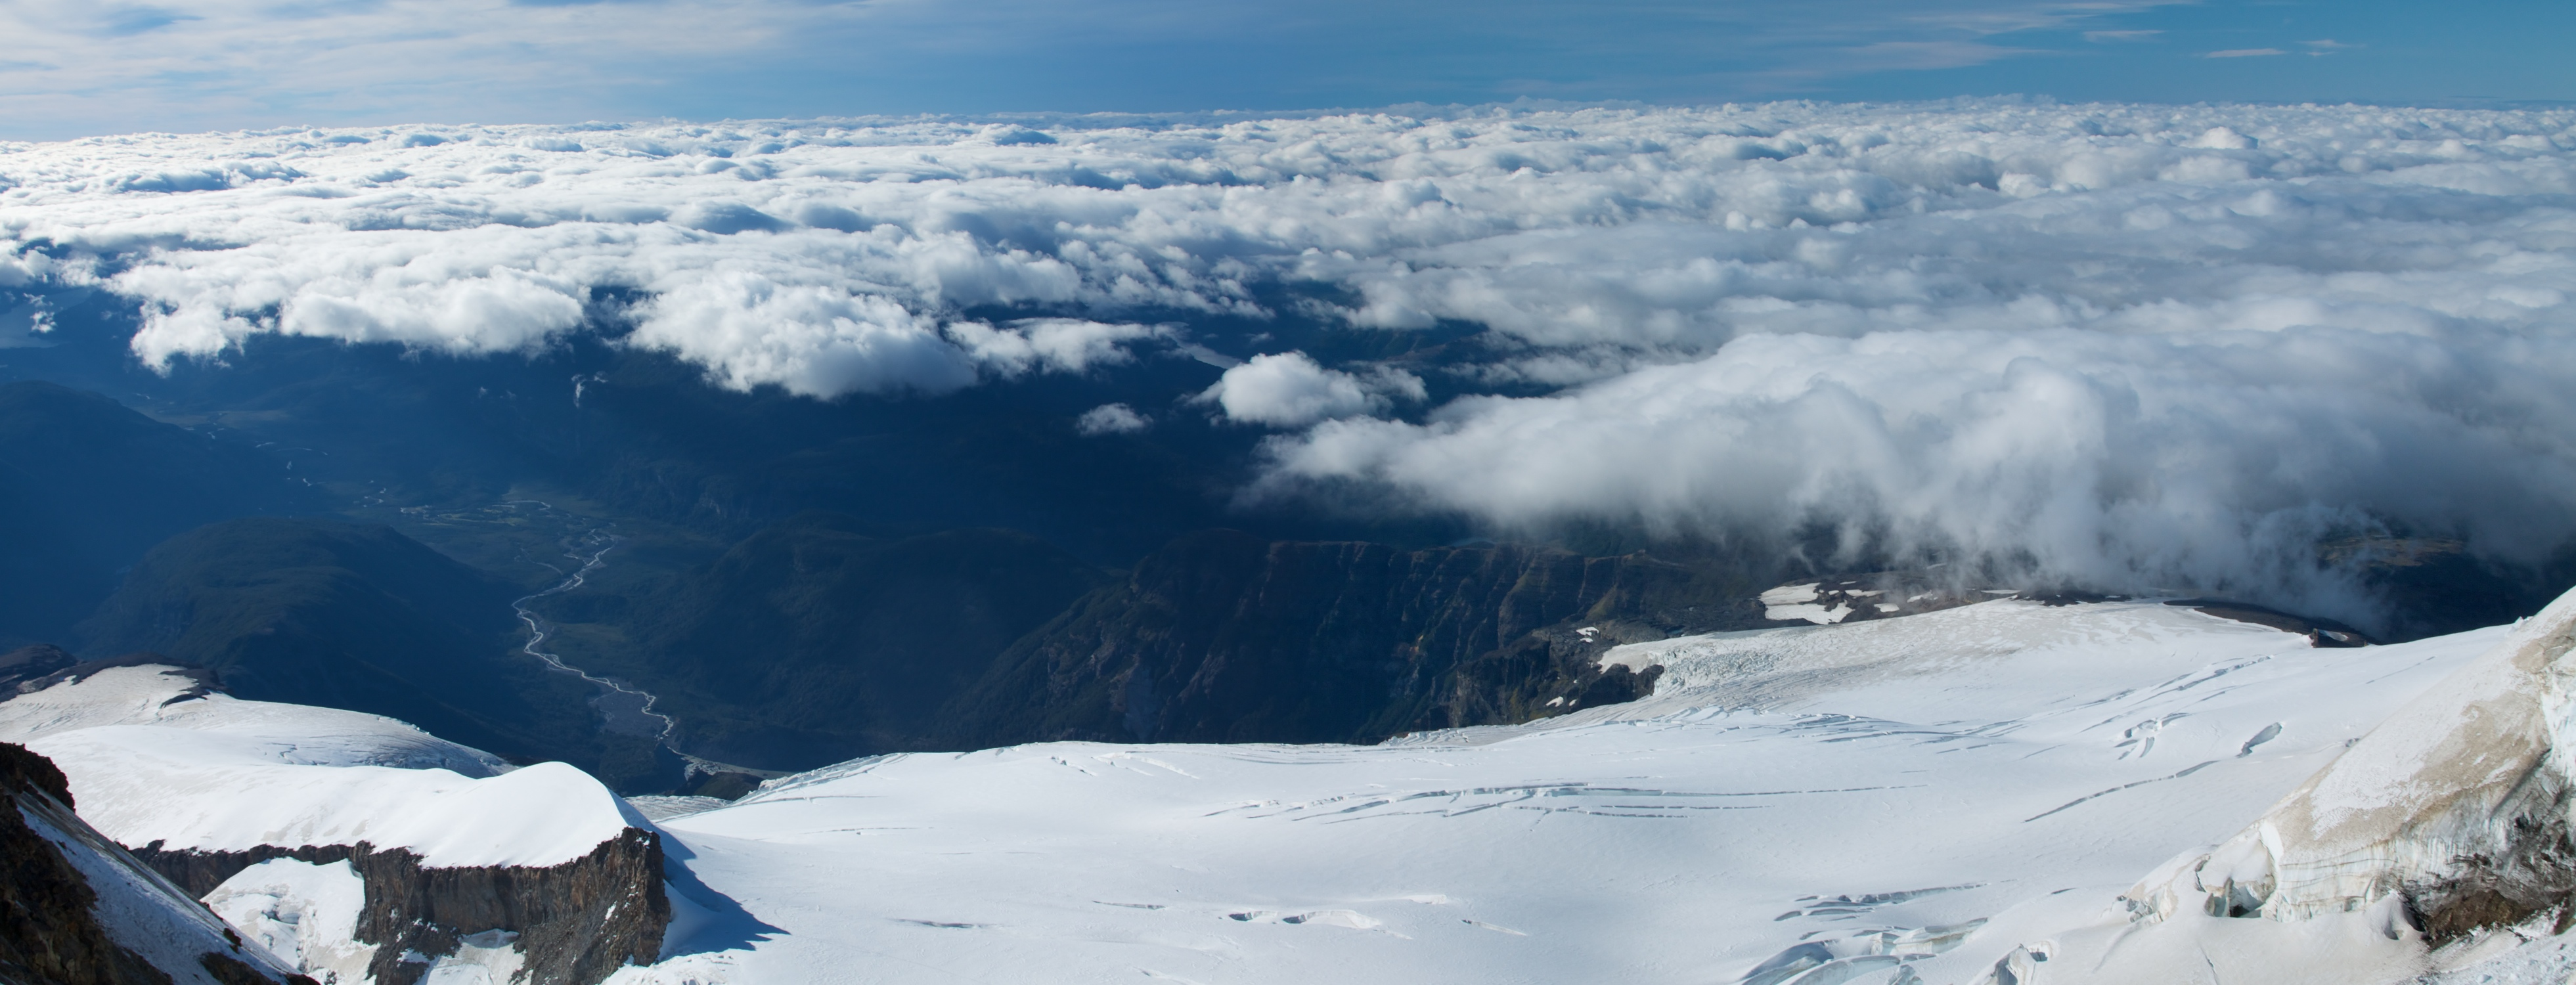 Monte Tronador - Vista do cume para lado da Argentina - Ruta de los Siete Lagos - Argentina - Wikimedia Commons - McKay Savage